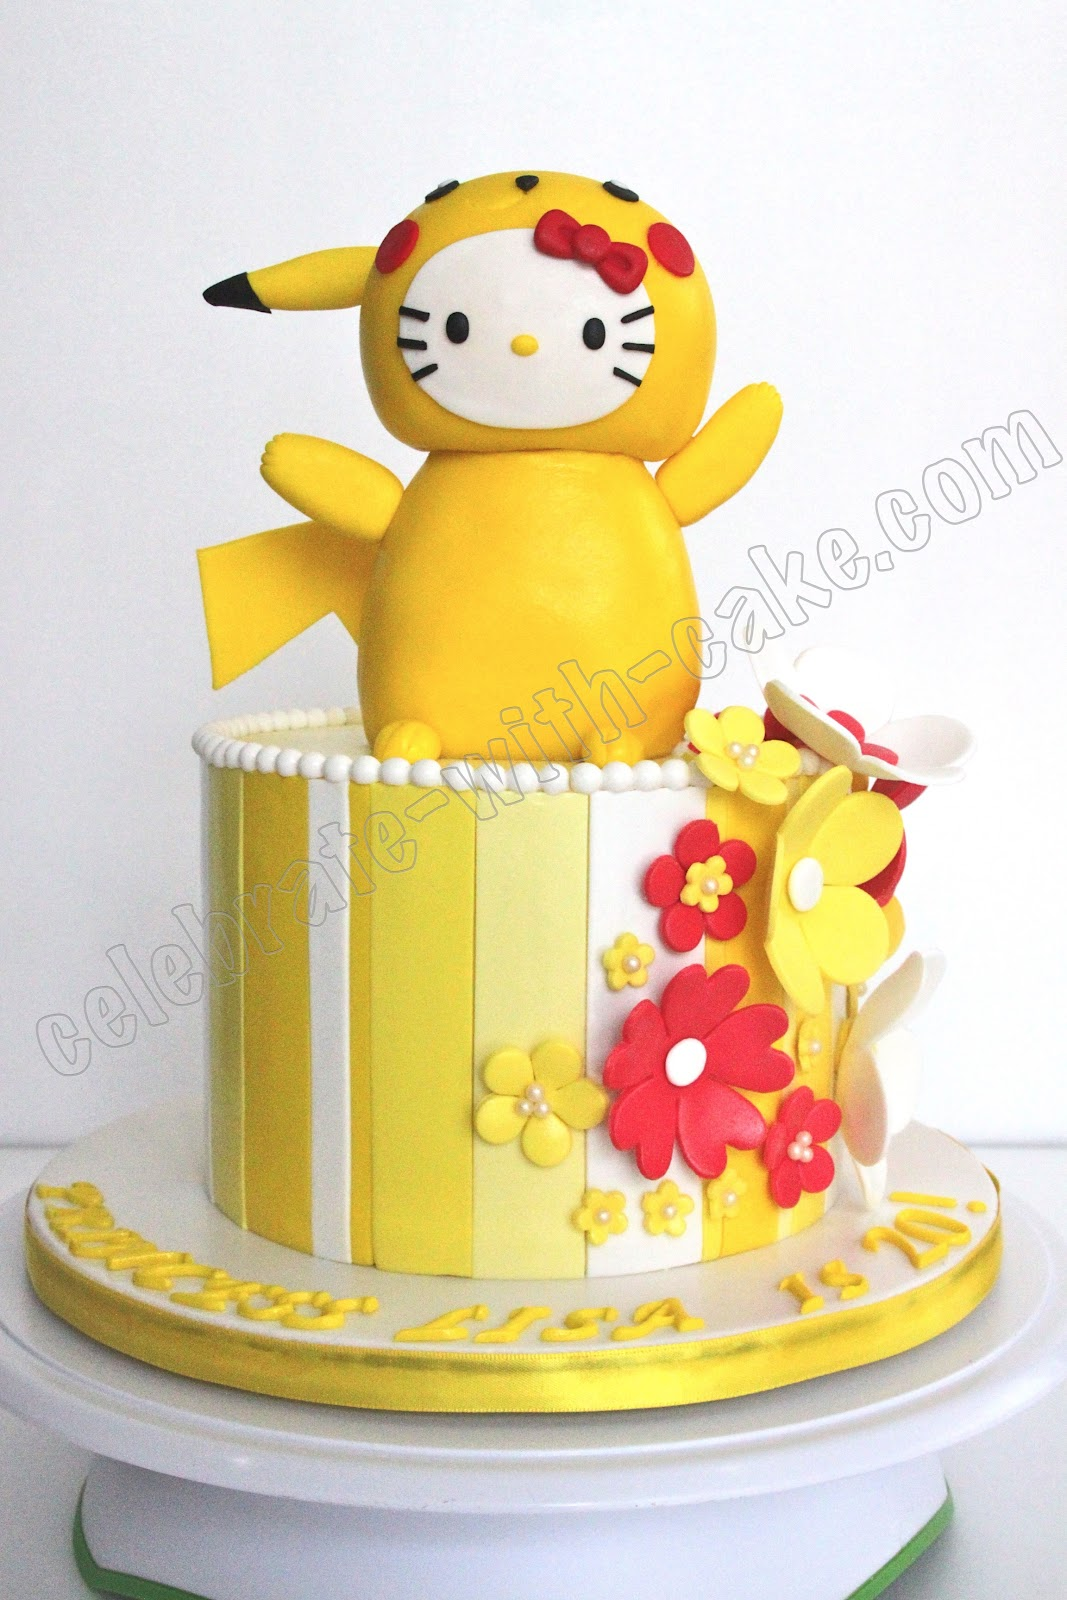 Pikachu Birthday Cake Celebrate with Cake!: ...